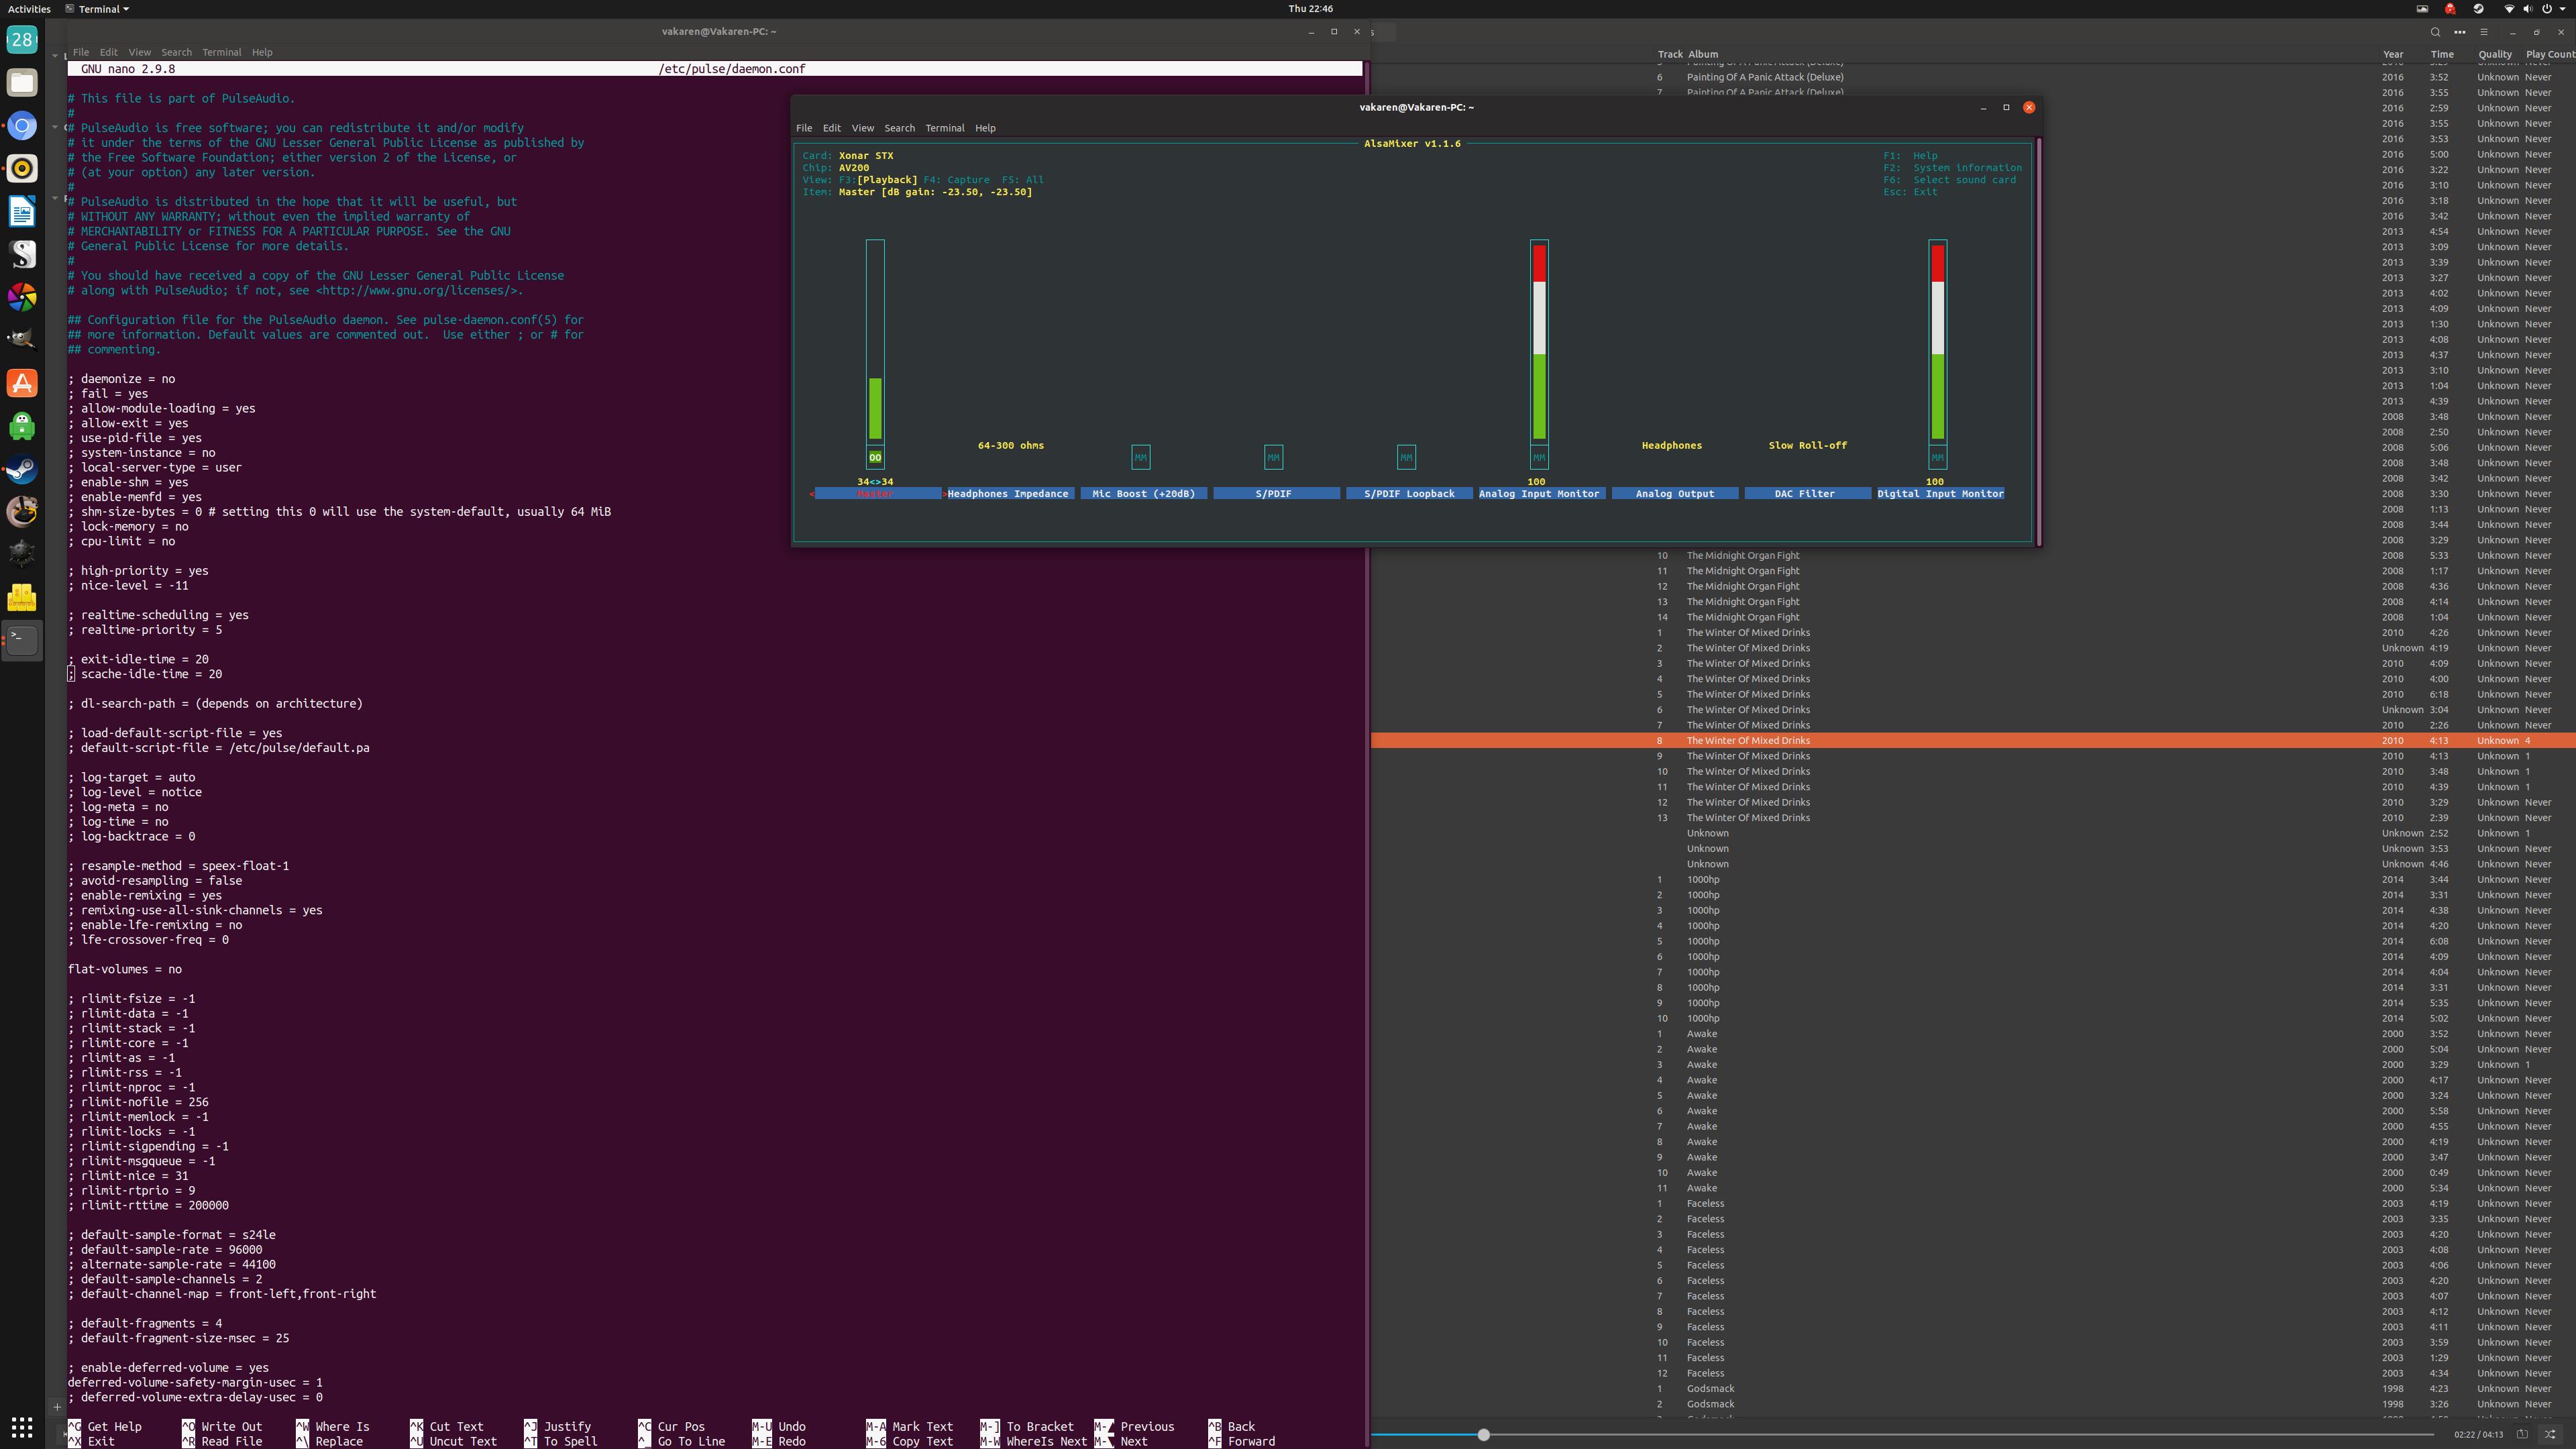 solved]Configure Xonar STX for Linux/Ubuntu - Linux